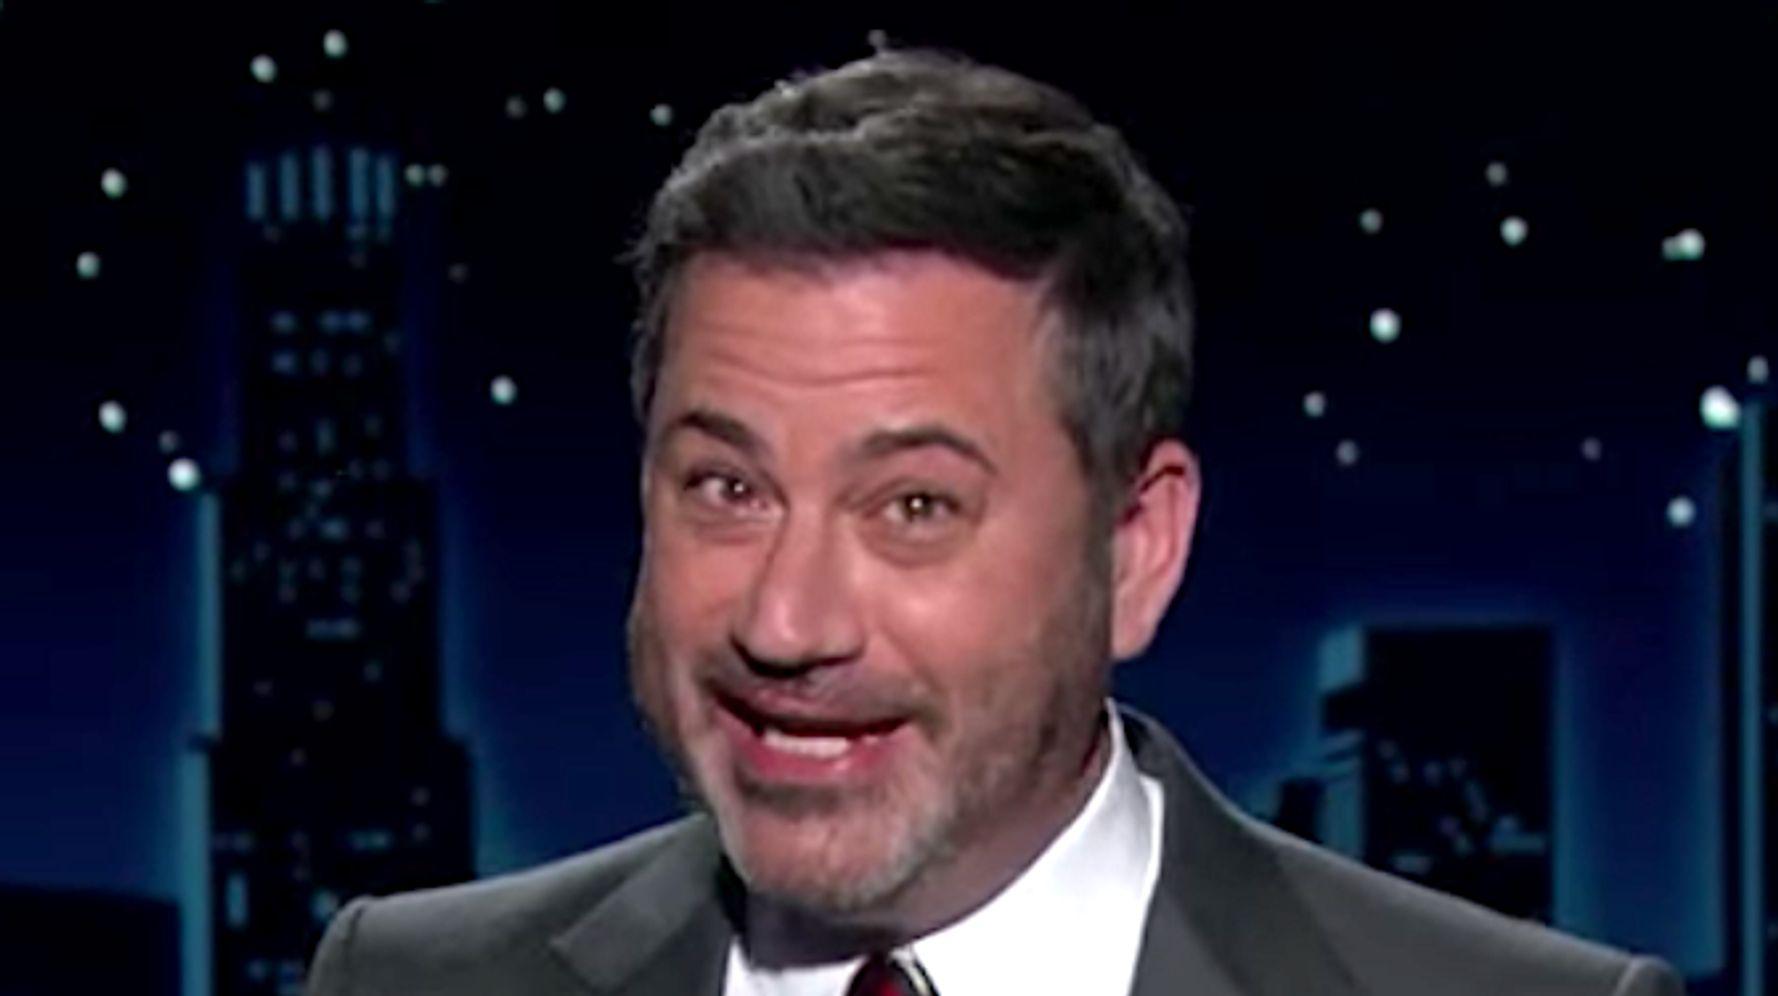 Kimmel Pities 'Poor Rudy Giuliani' Over Golden Globes Nomination Snub